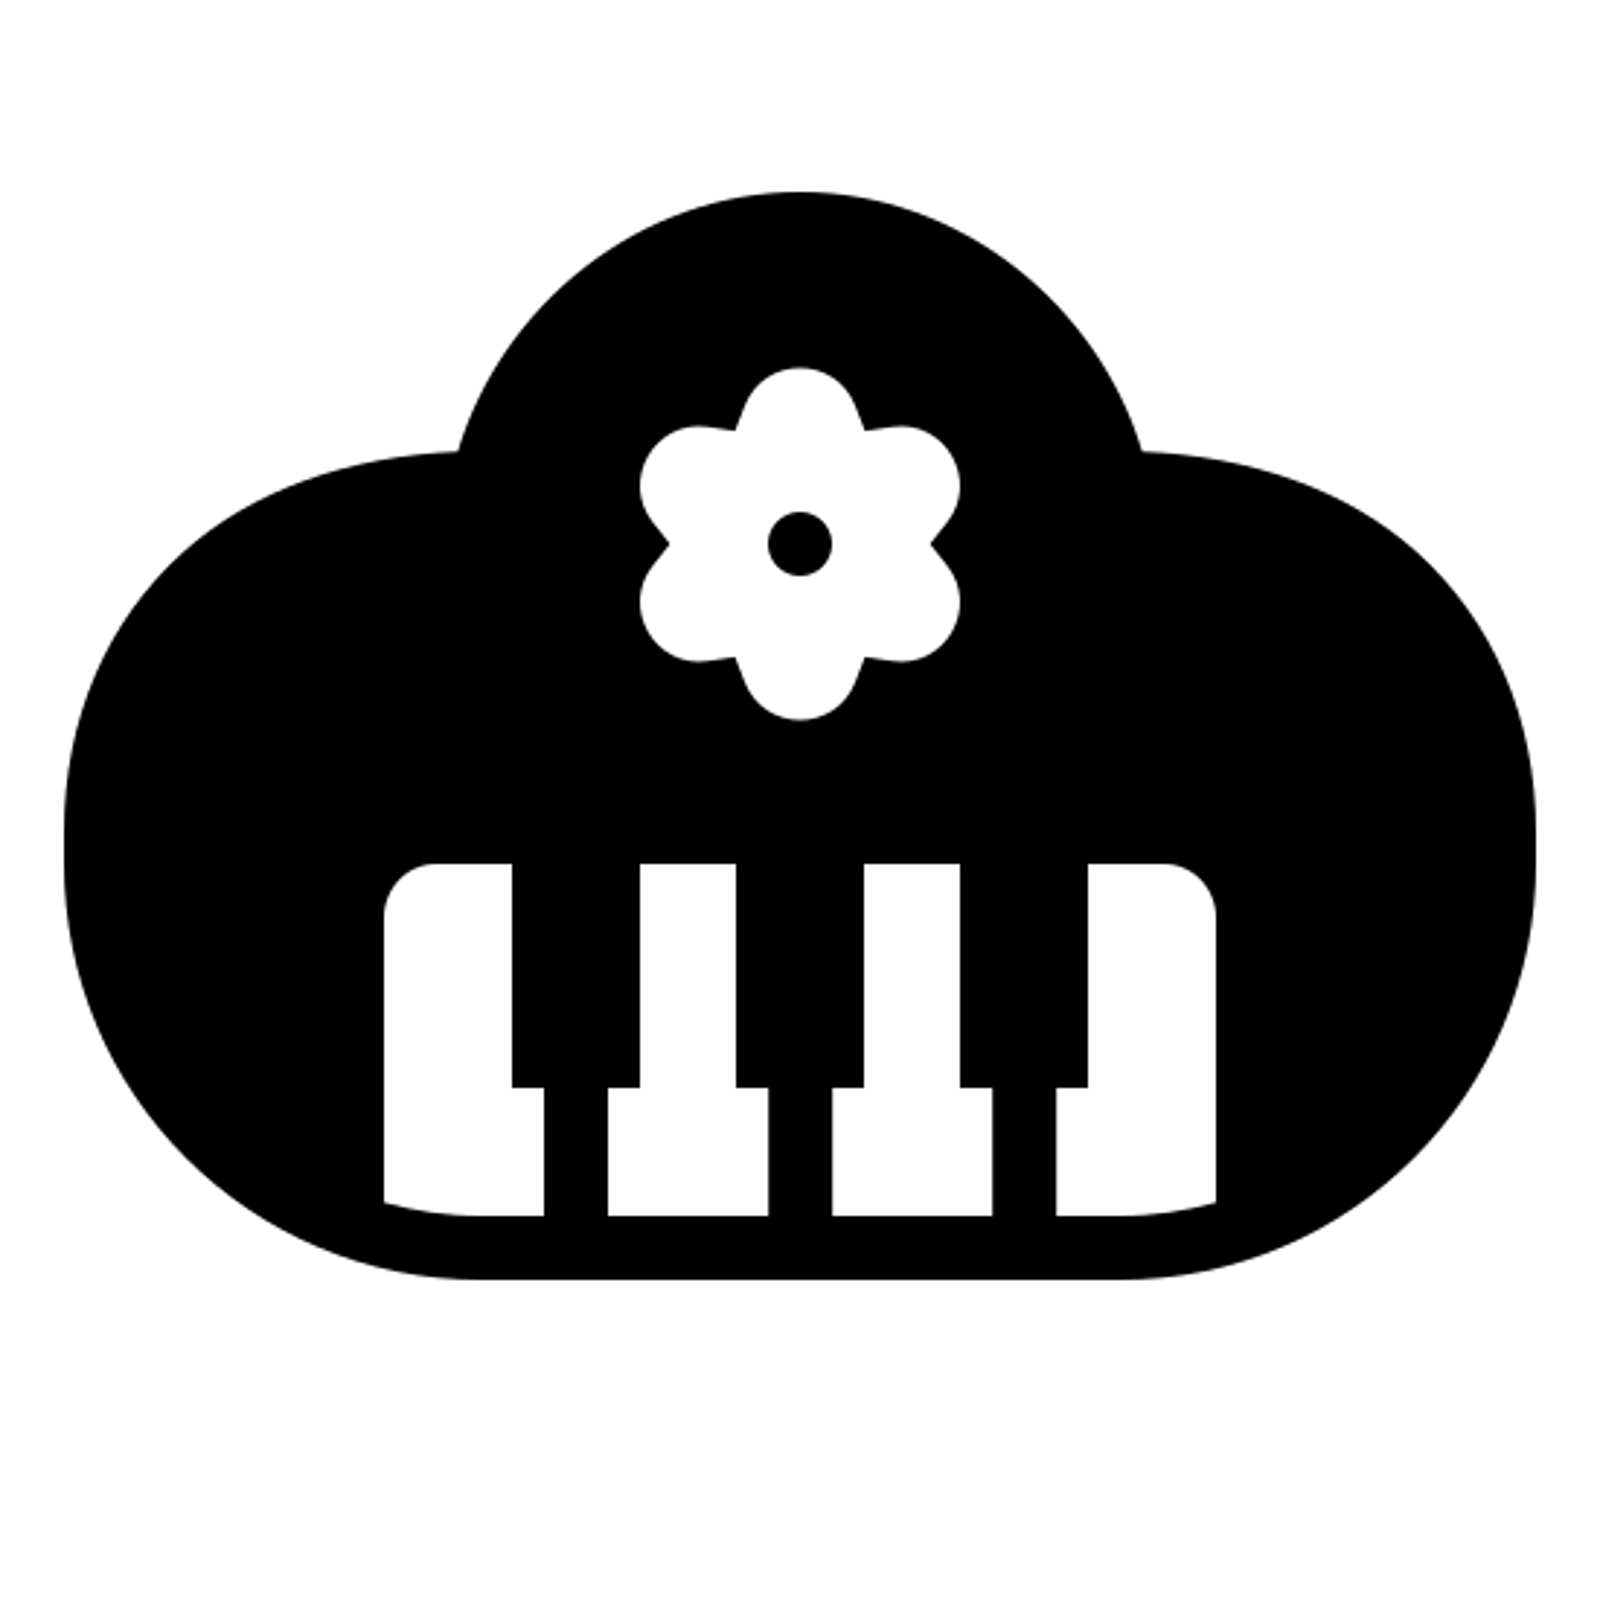 Children's music Filled icon